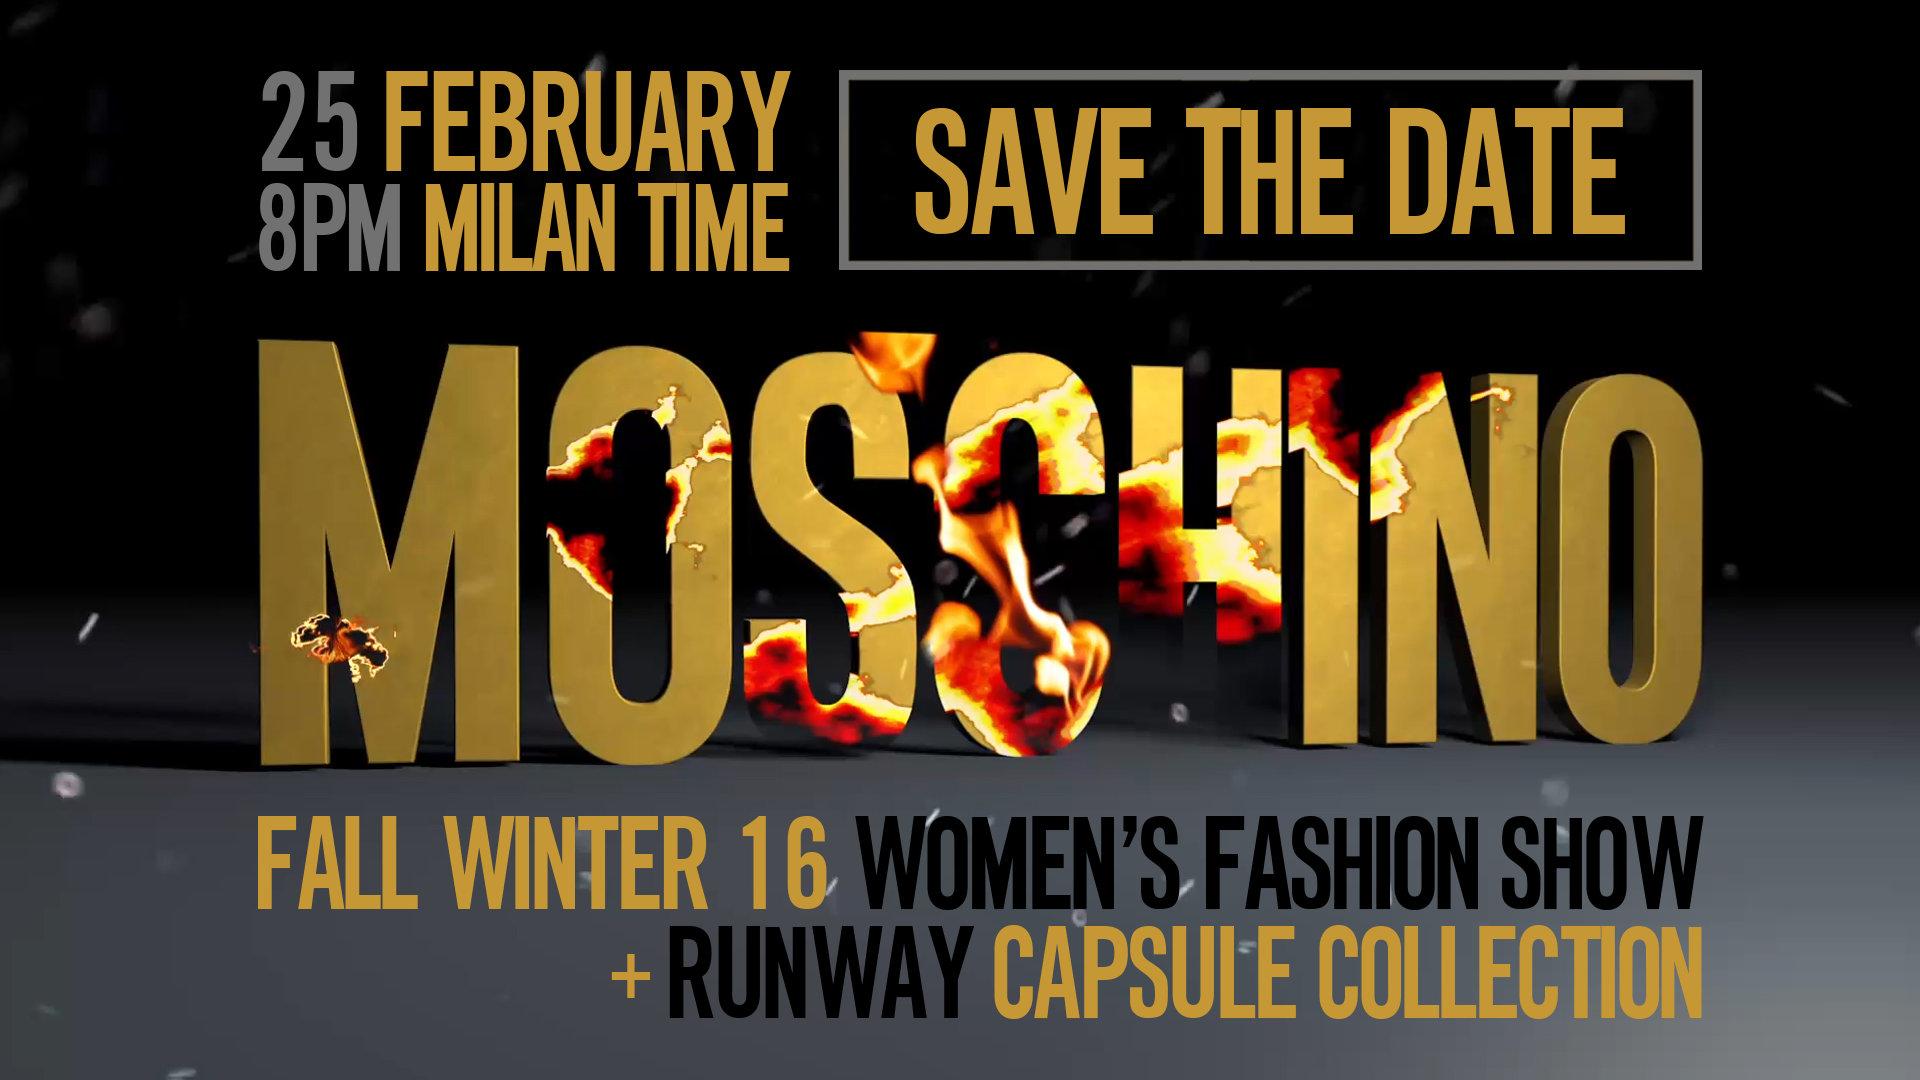 Moschino Fall Winter 2016 Women's Fashion Show Live Streaming